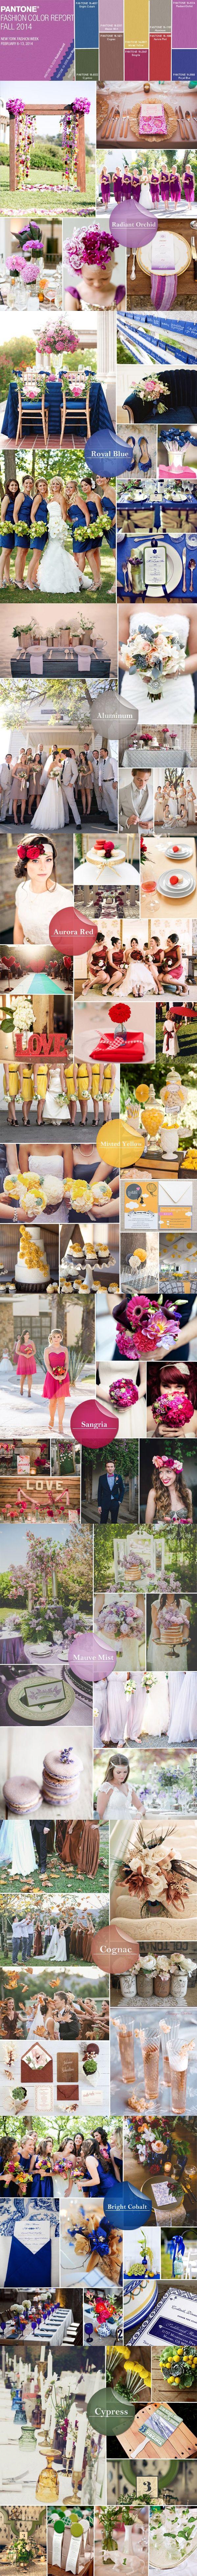 Pantone fall wedding color schemes 2014